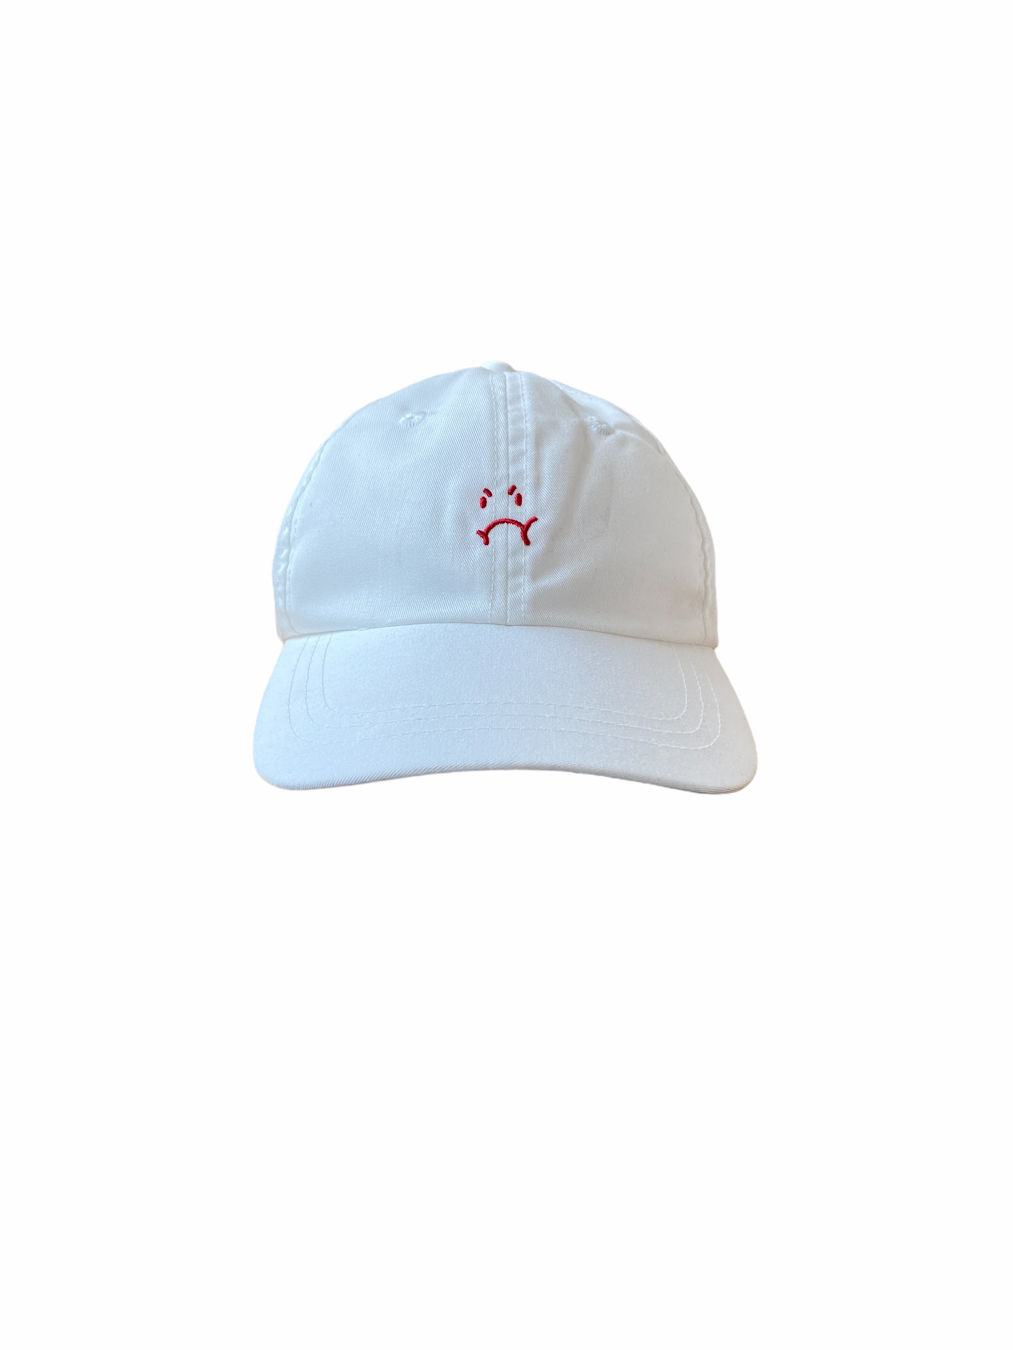 The Hangry Cap